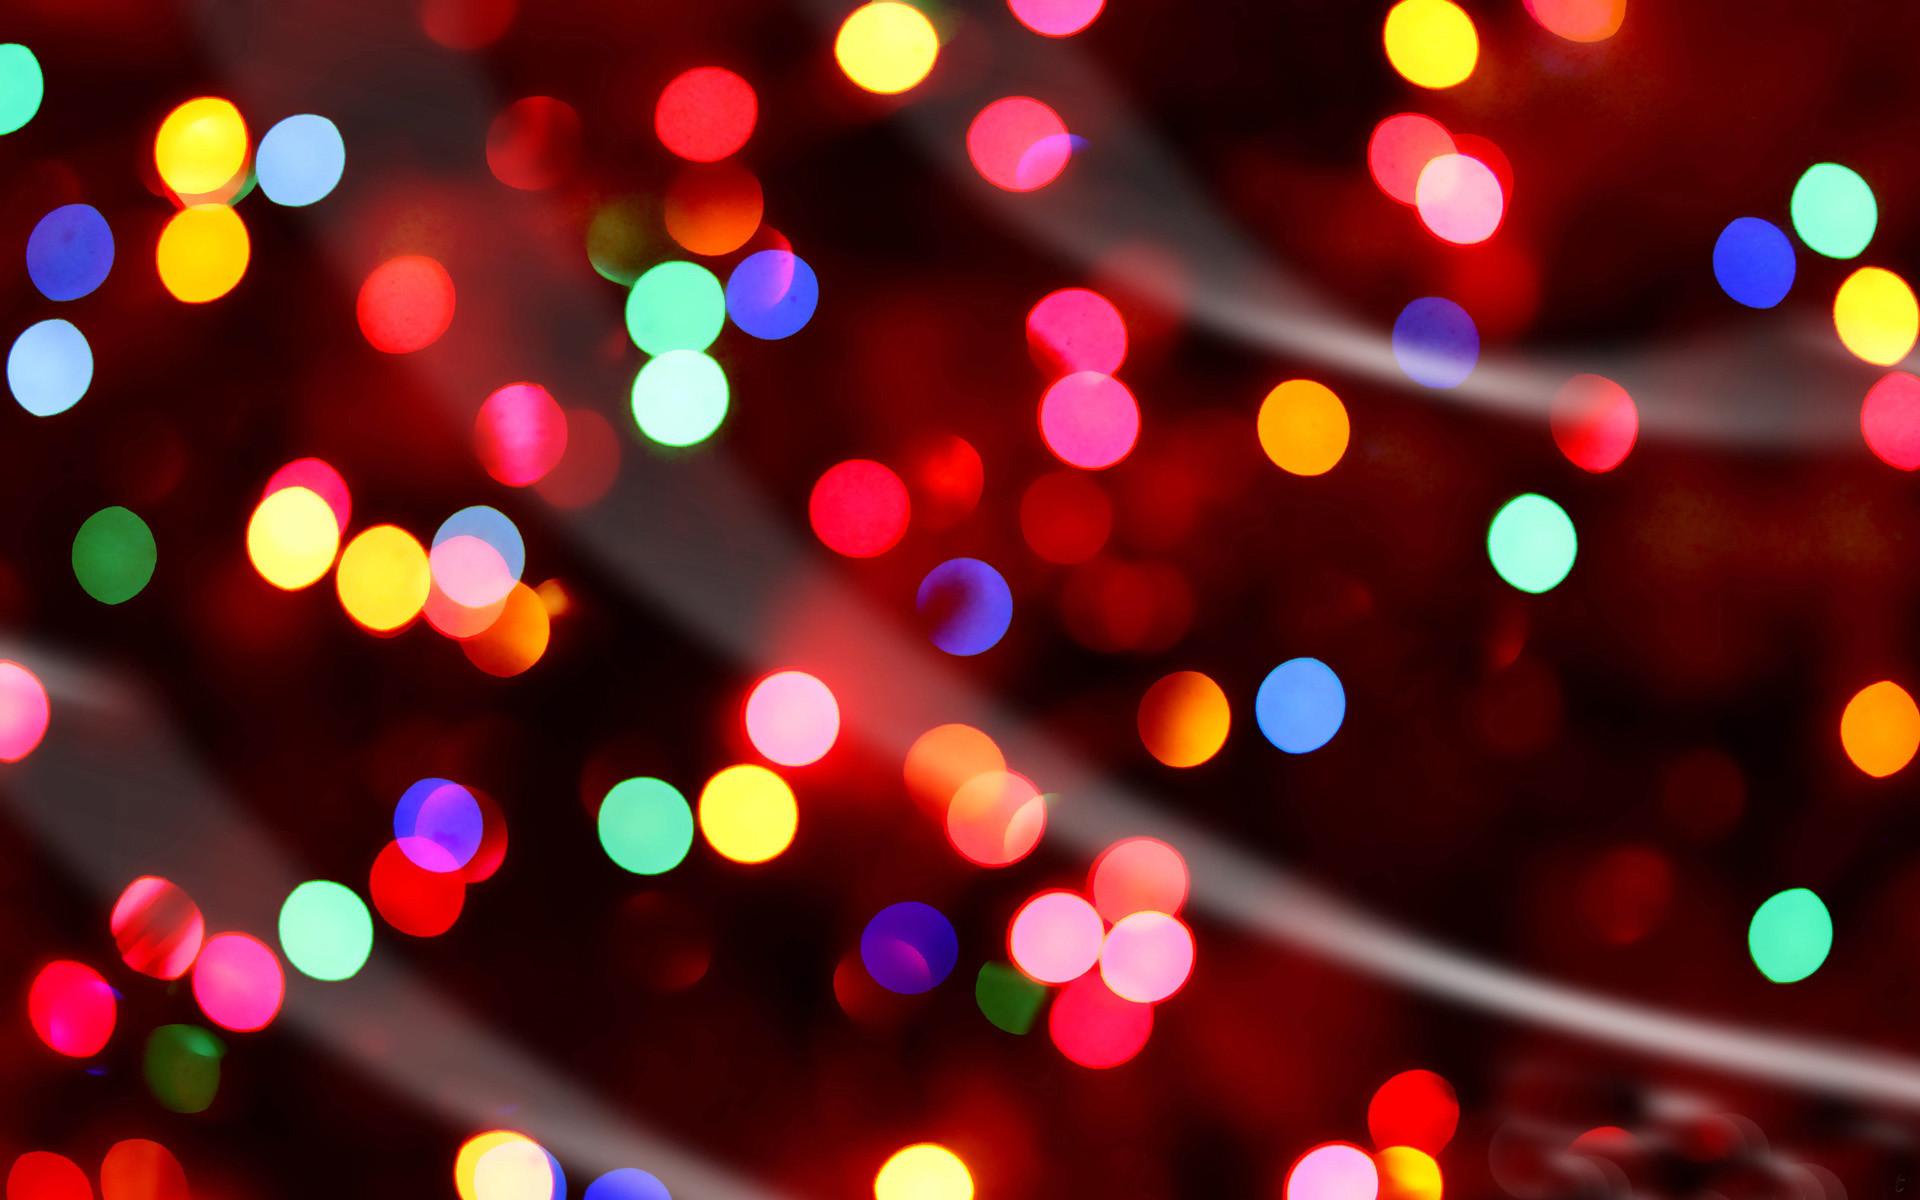 Christmas lights wallpaper.